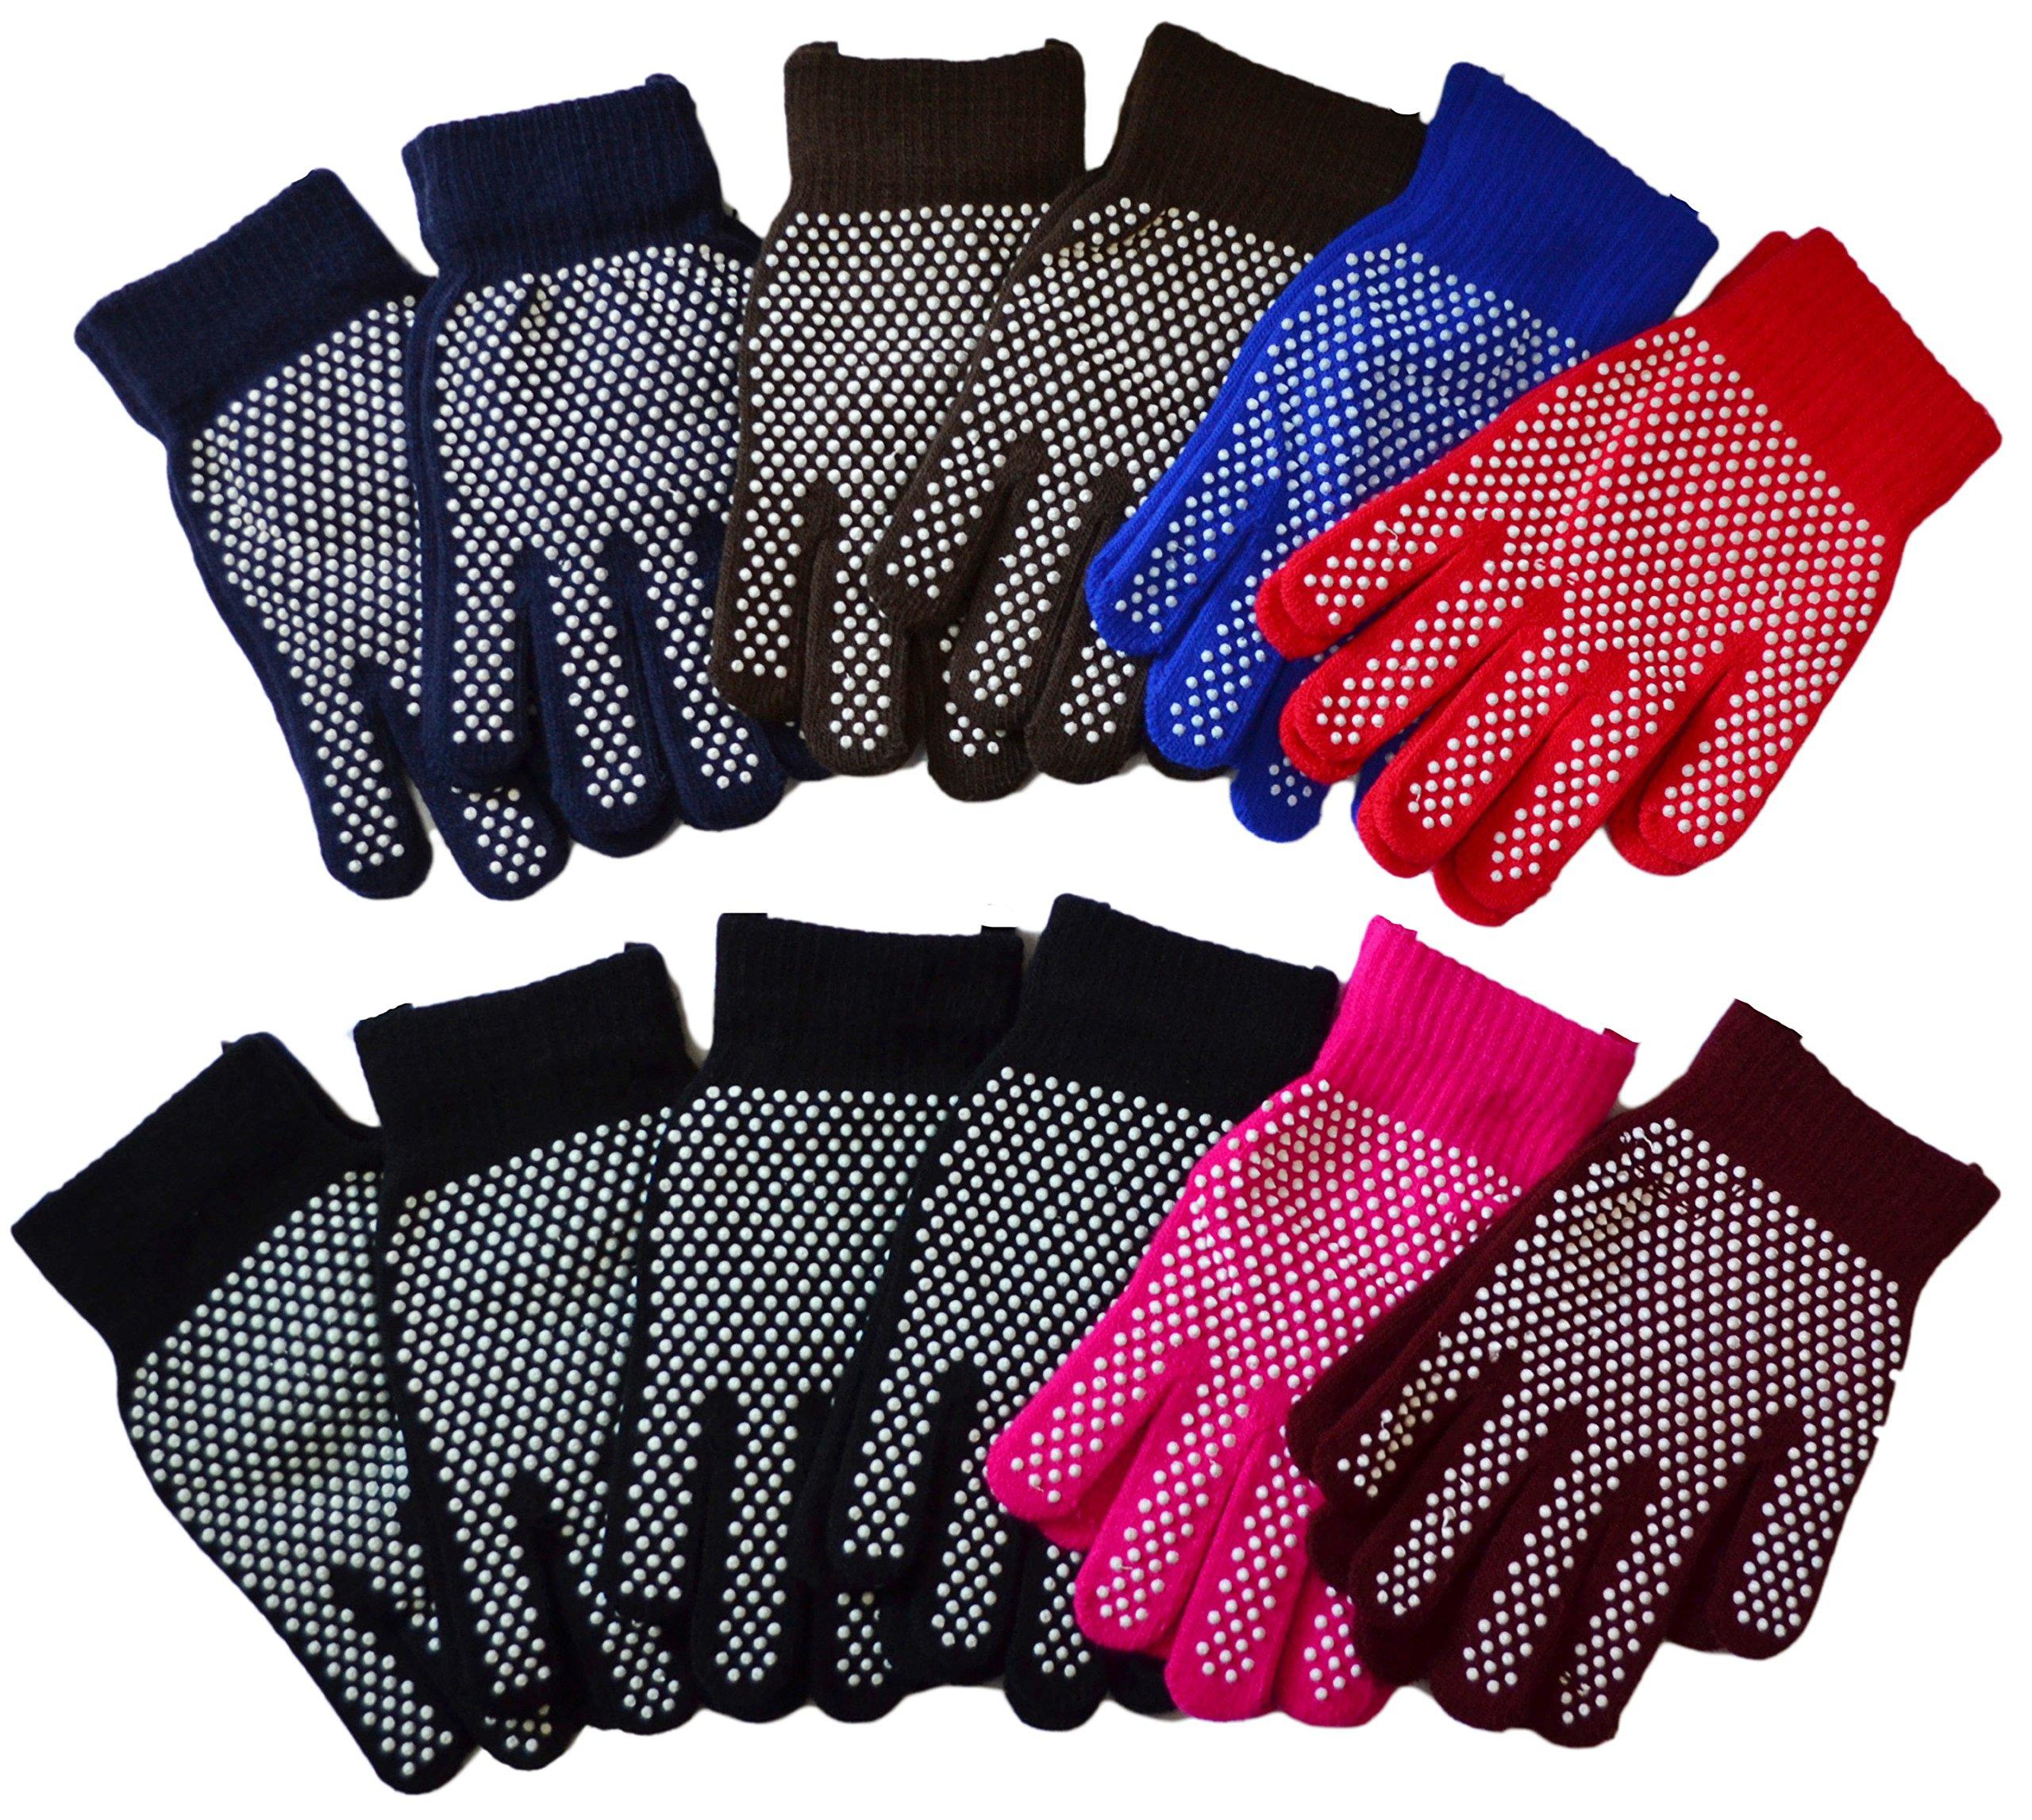 OPT Brand. 12 Pairs Wholesale Magic Knit Gripper NON-SLIP GRABBER PALMS Gloves Sports Work. USA Trademark Registered Code: 86522969.